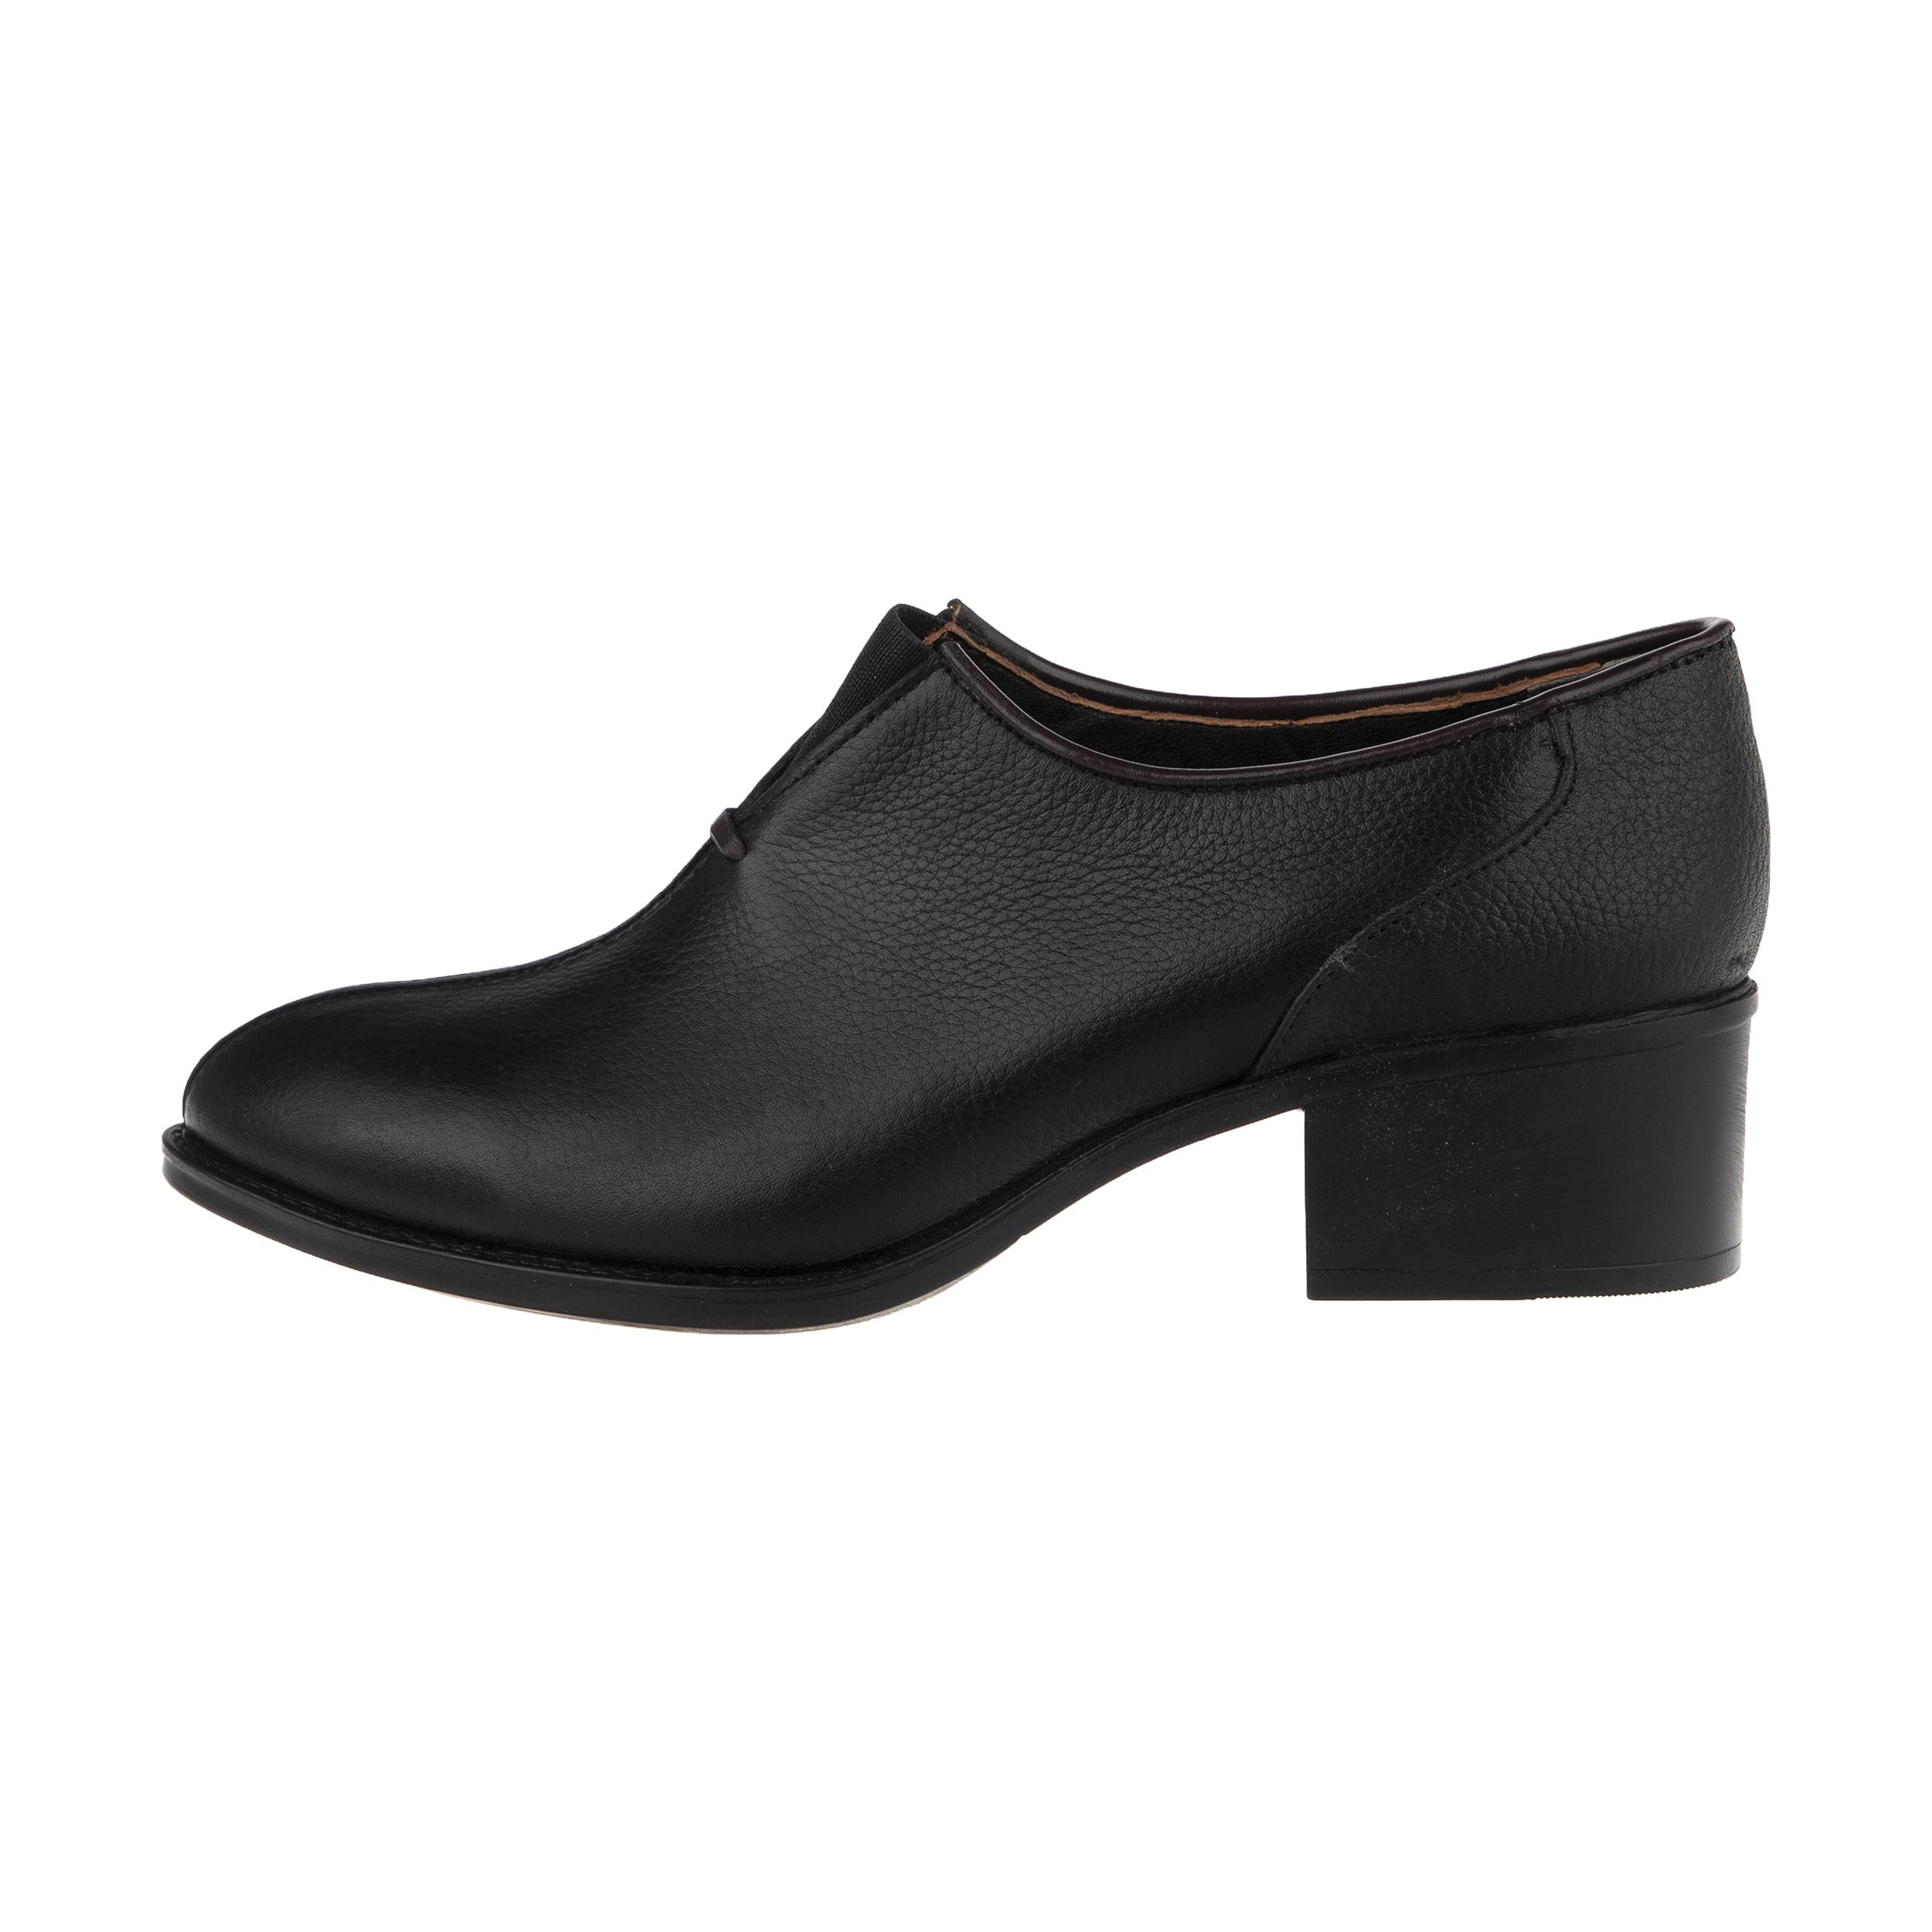 s25 کفش روزمره زنانه شیفر مدل 5310a500101